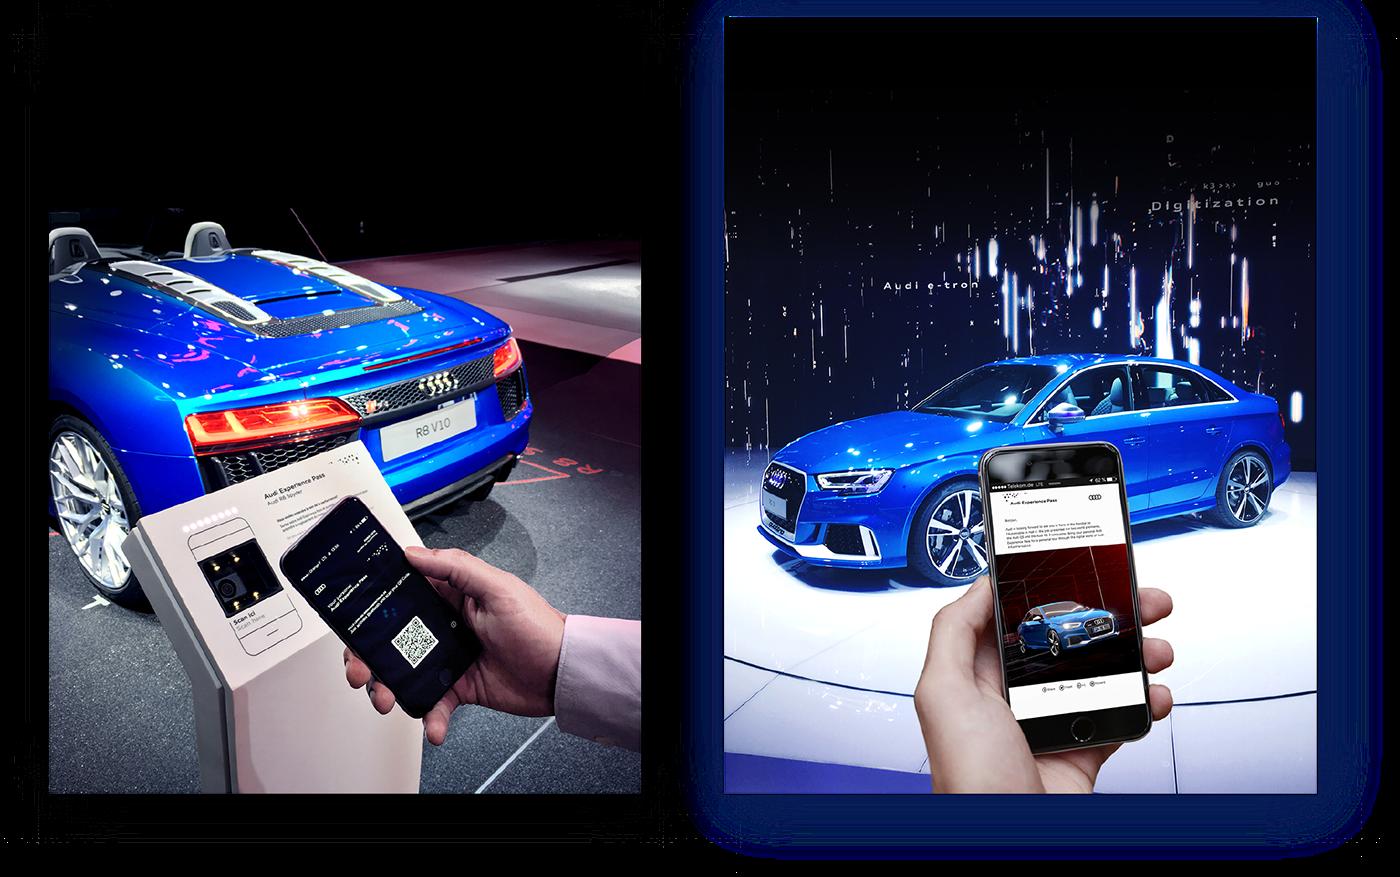 Audi,Mondial de l'Automobile,bluetooth,beacon,Digitization,Interaction system,ibeacon,WALLET,pass